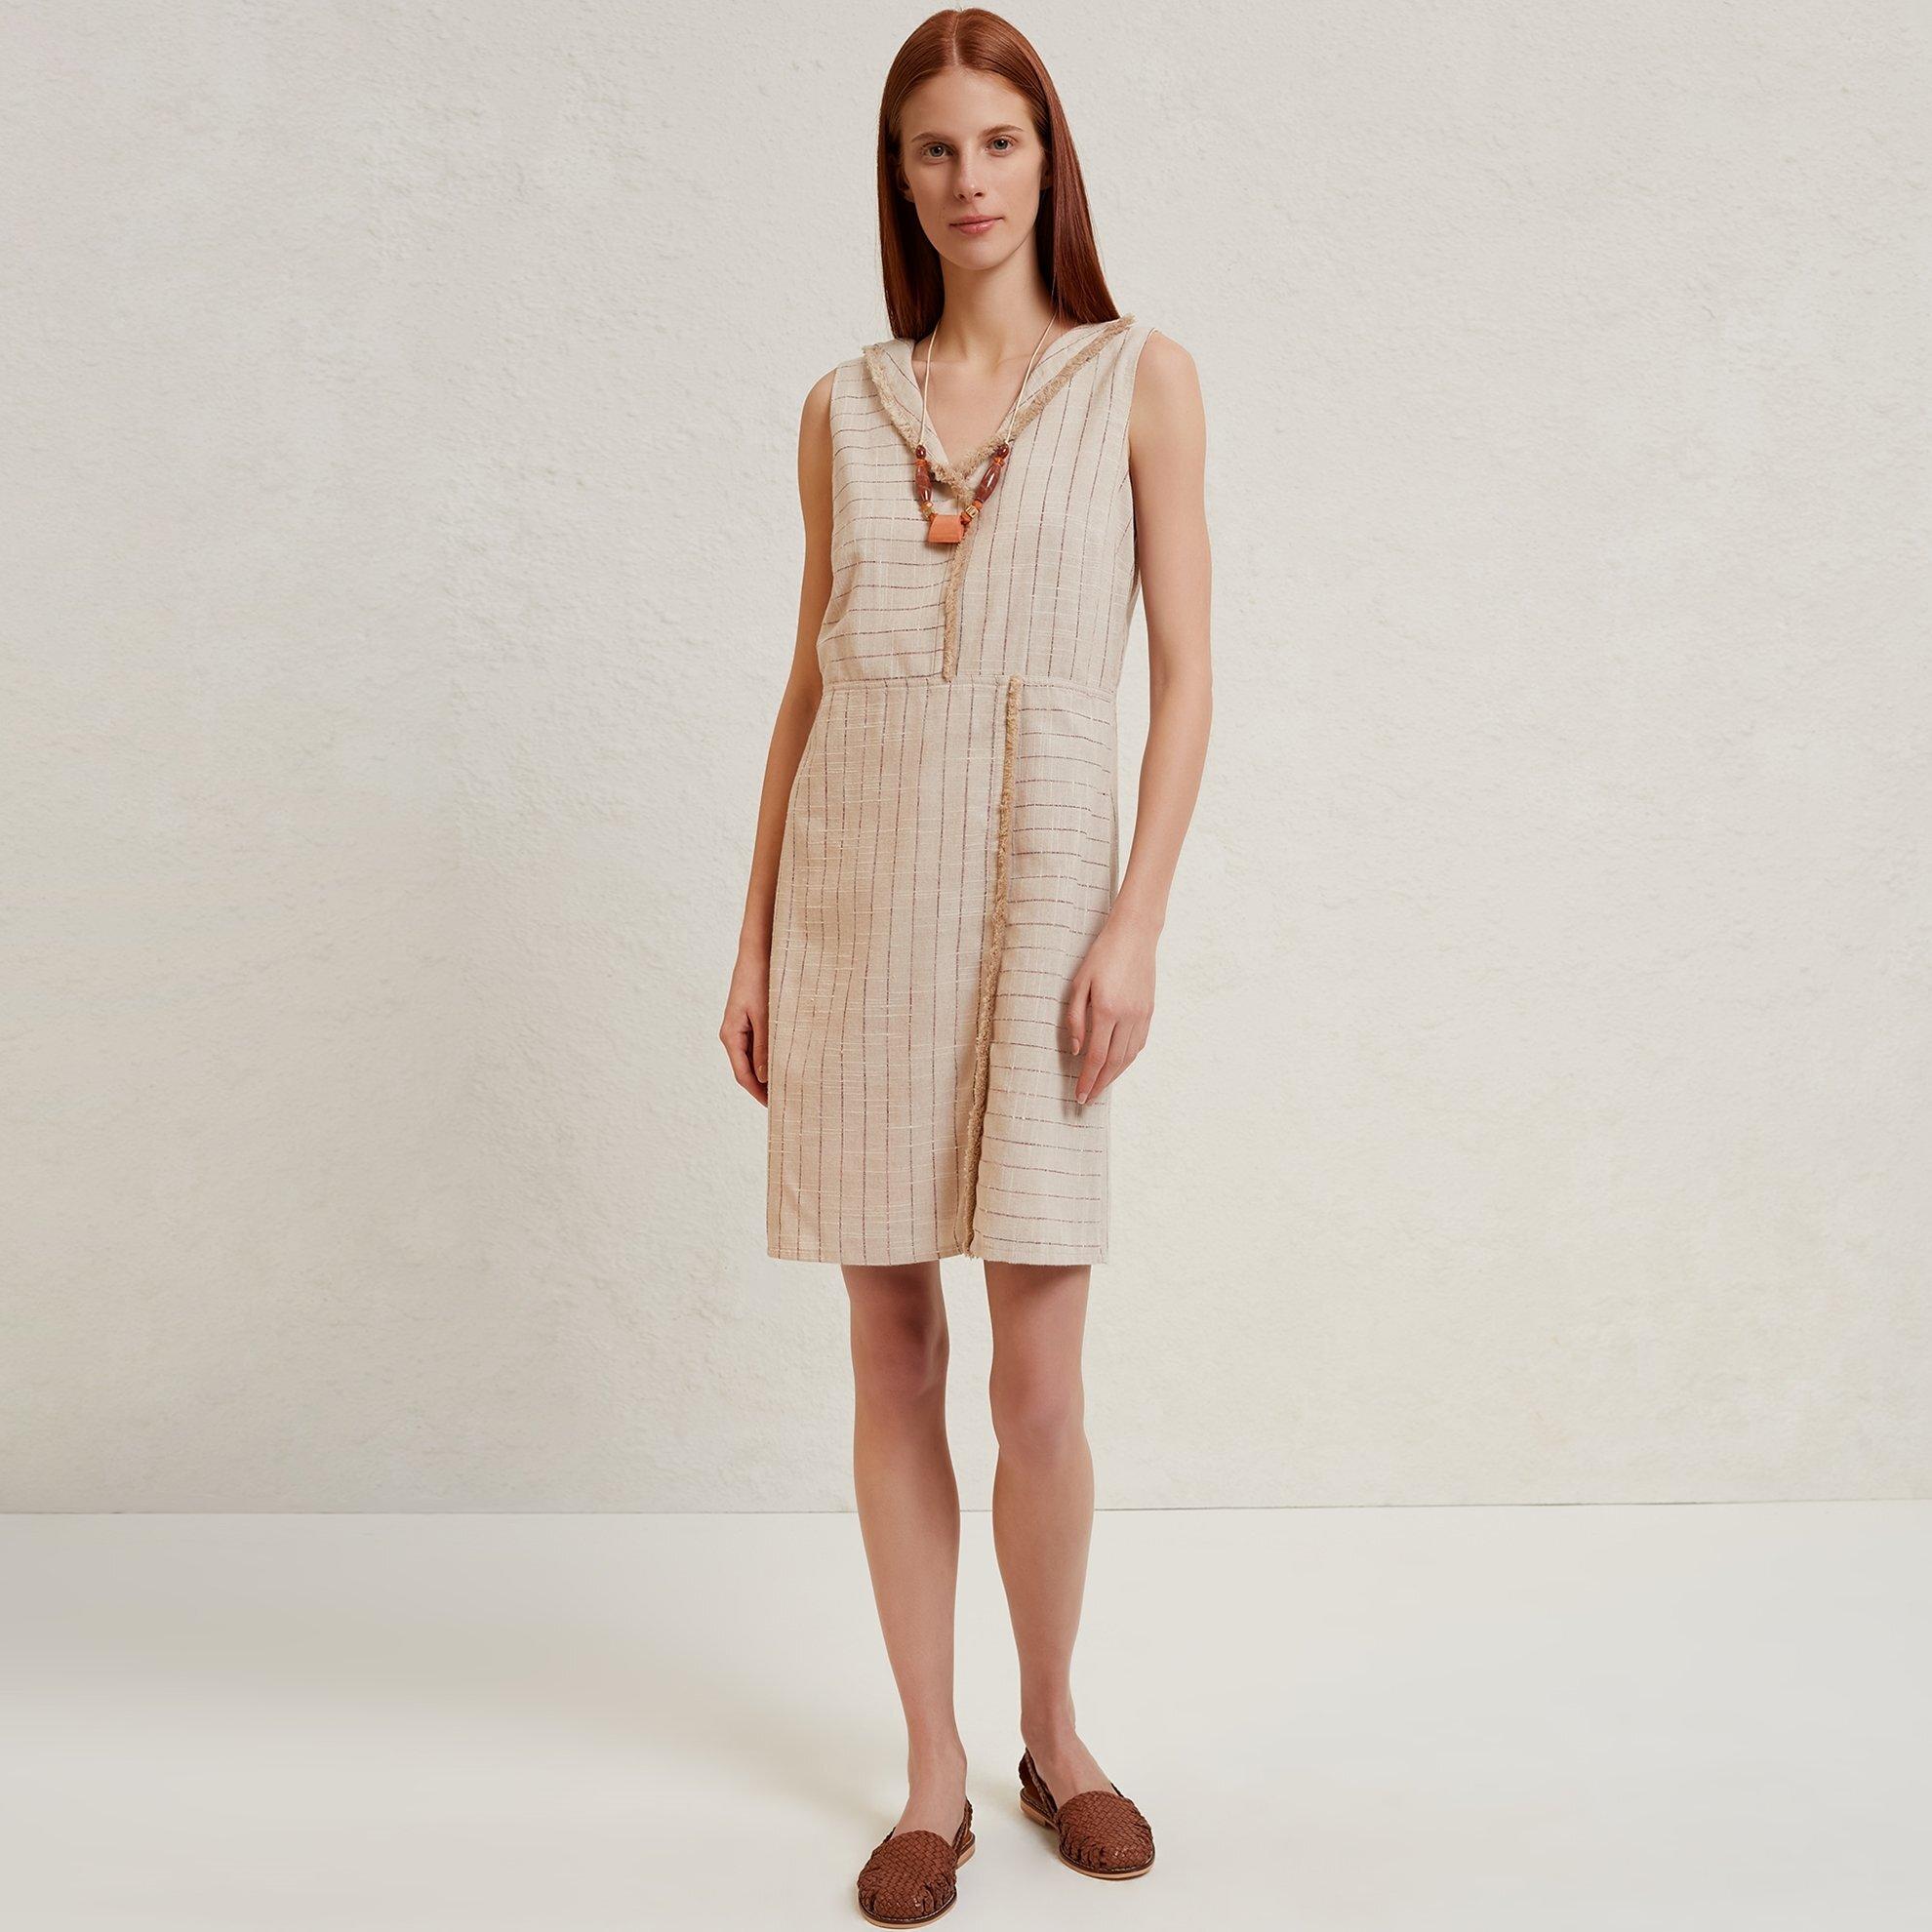 Panelled Dress